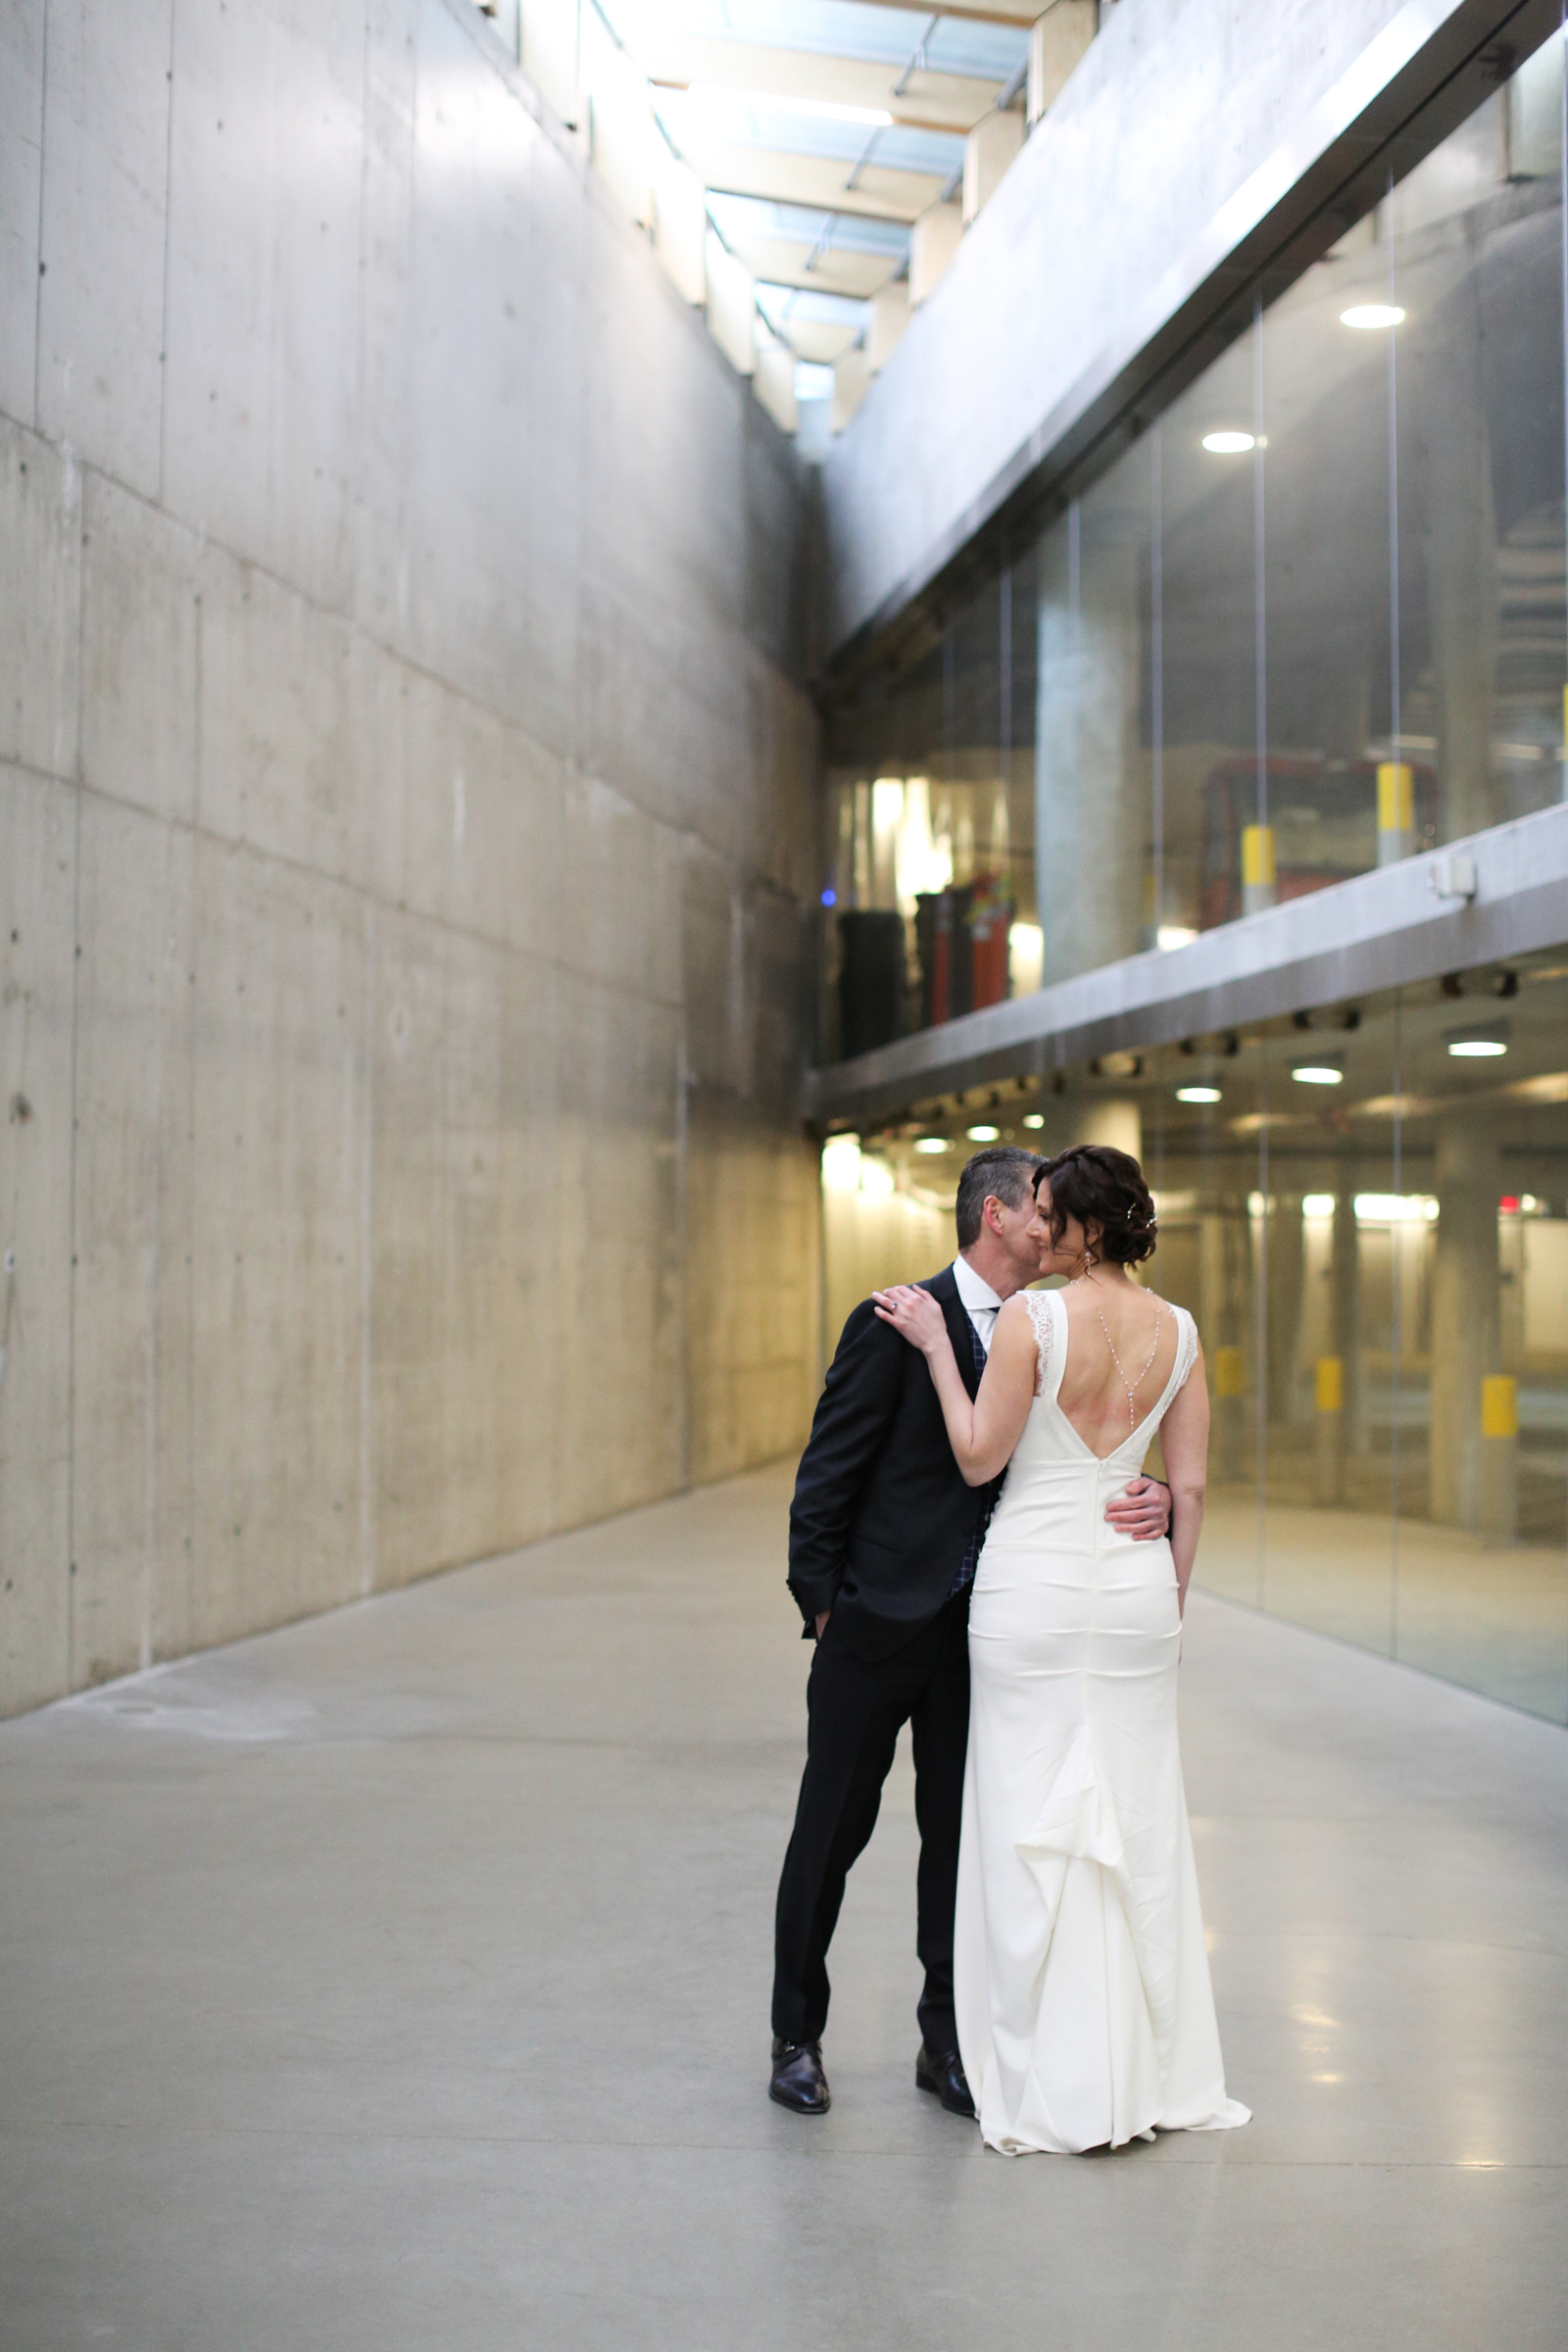 Melanie+Vince-Wedding-10.jpg